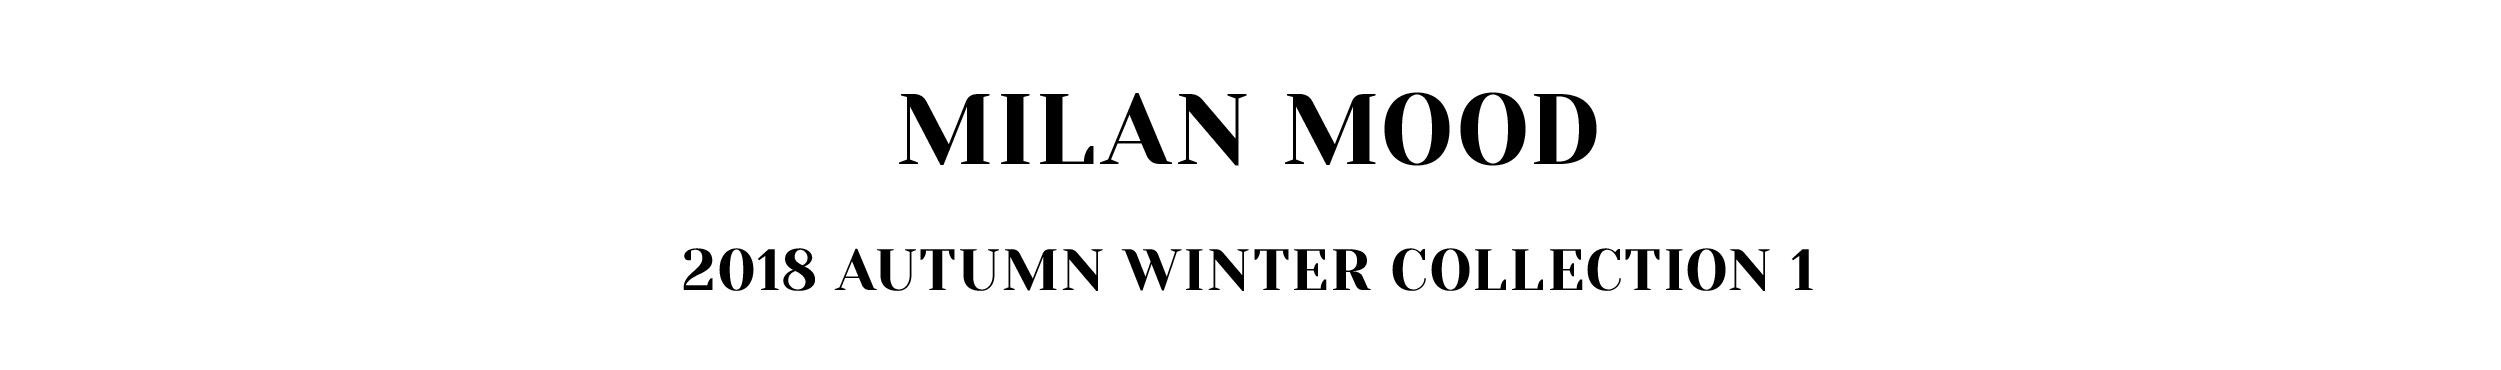 MILAN MOODMILAN MOOD 2018 AW COLLECTION1